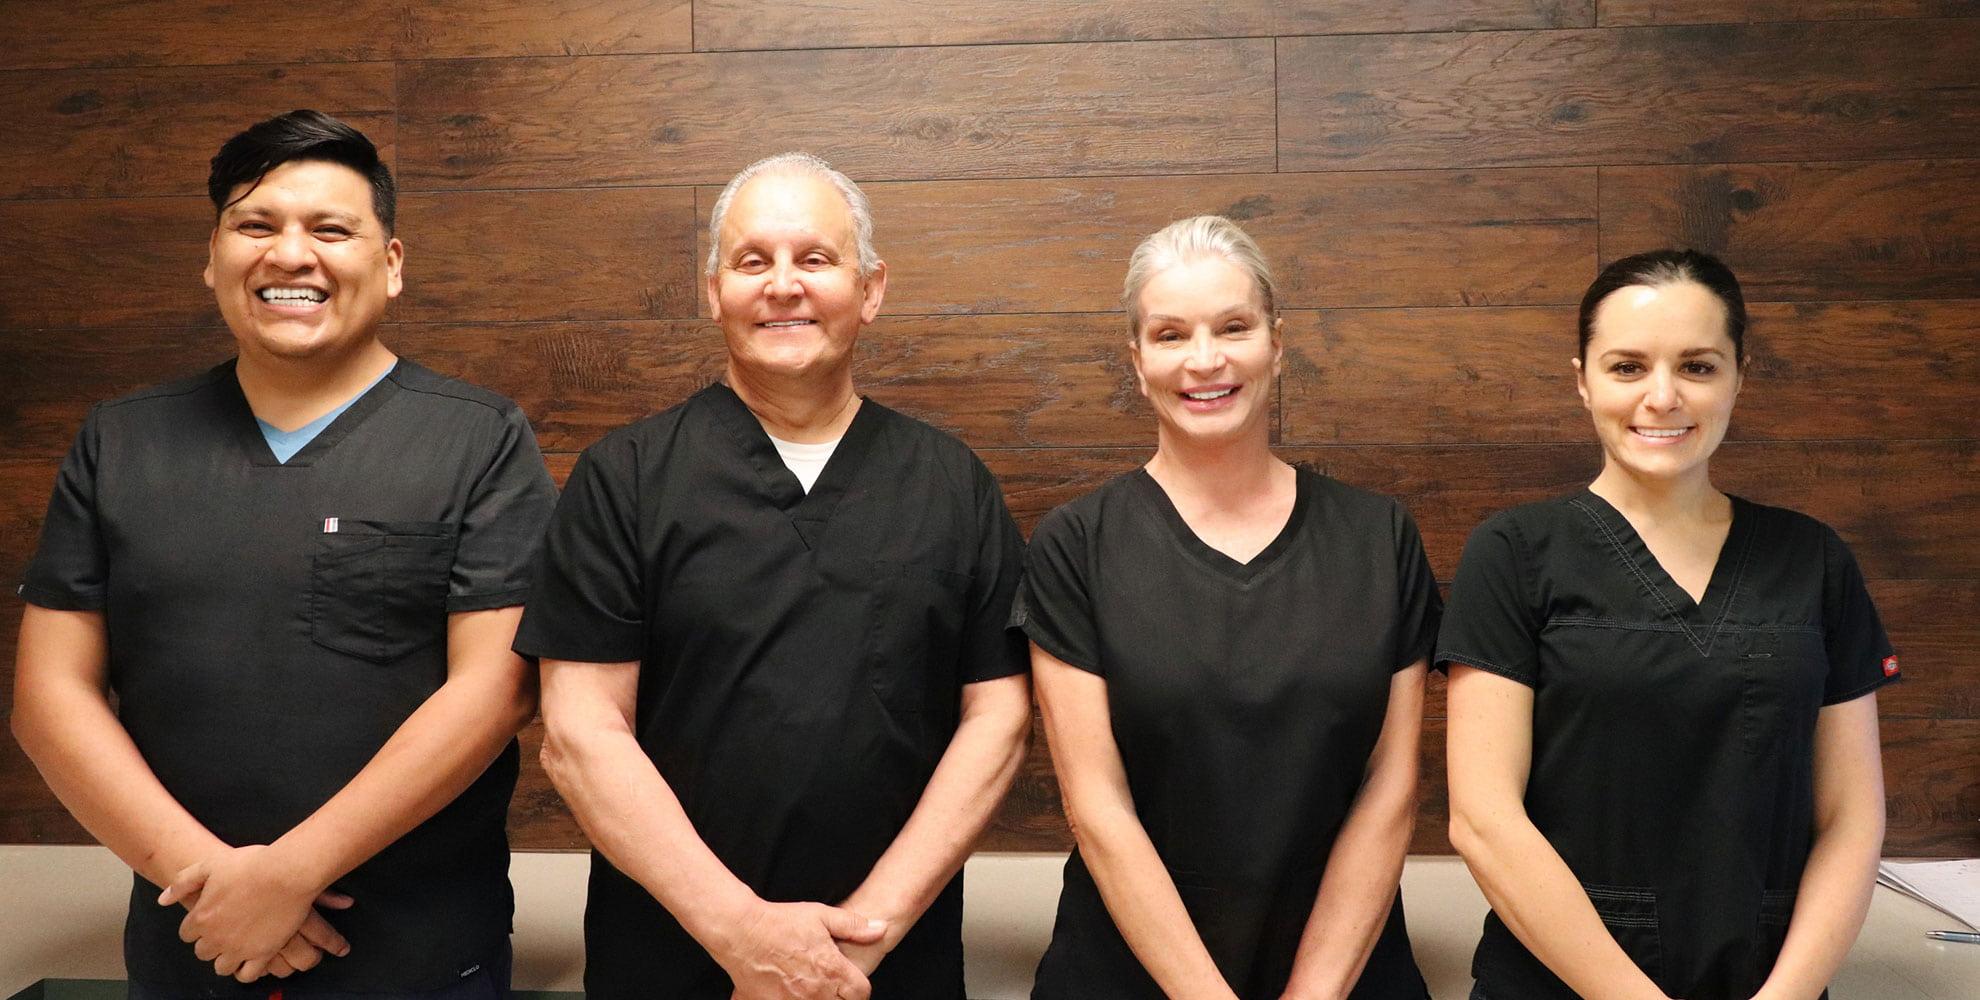 Kaban Endodontics Team of experts smiling